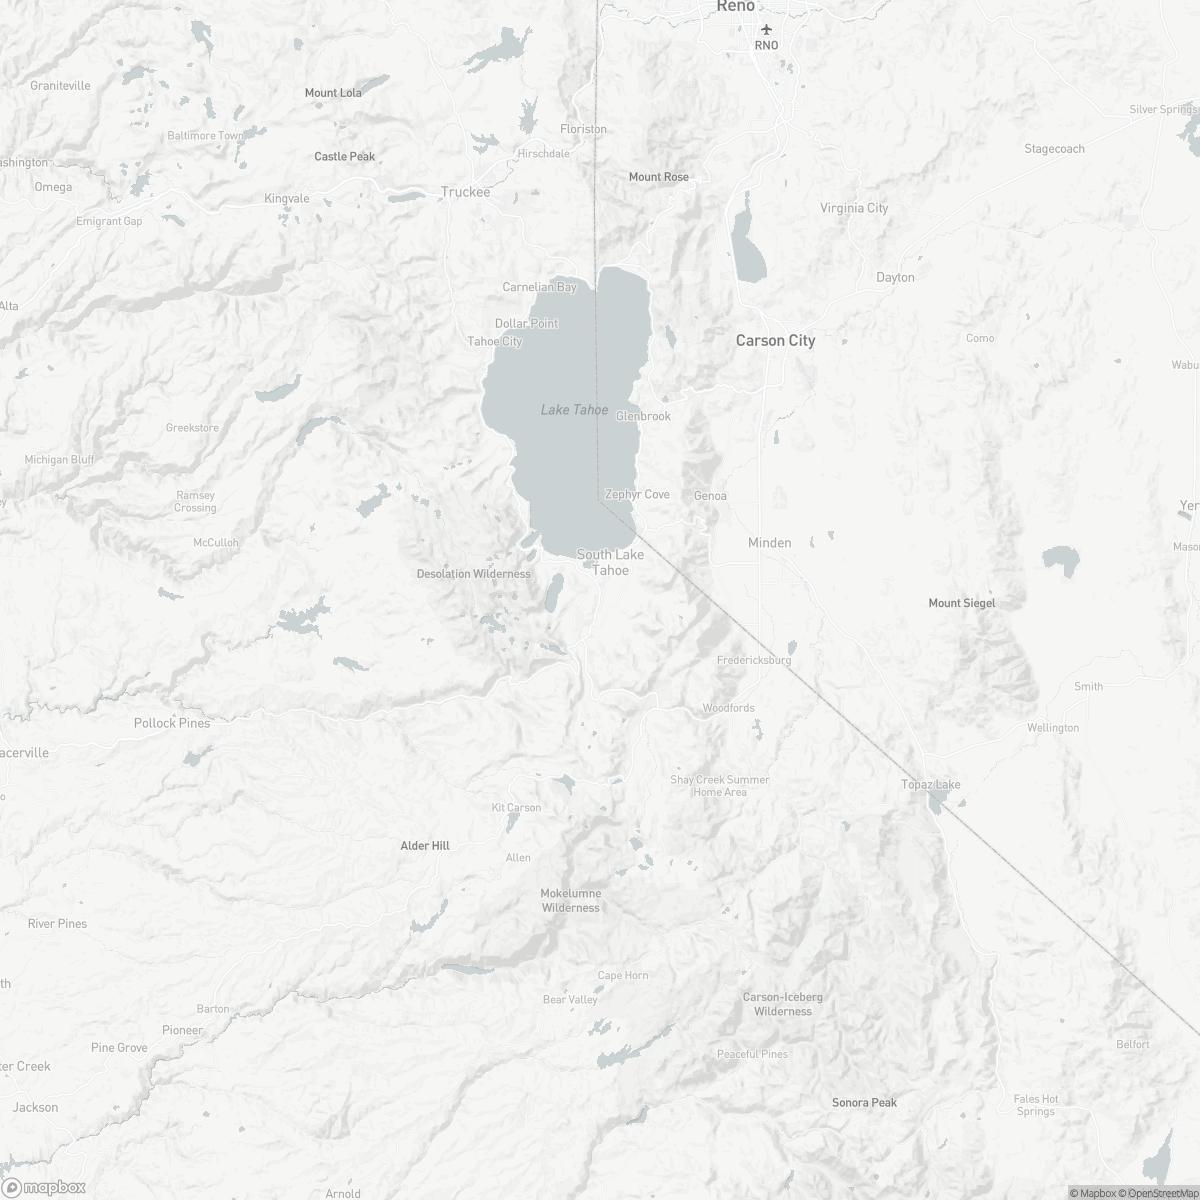 Map of South Lake Tahoe Airport TVL surrounding area of South Lake Tahoe California